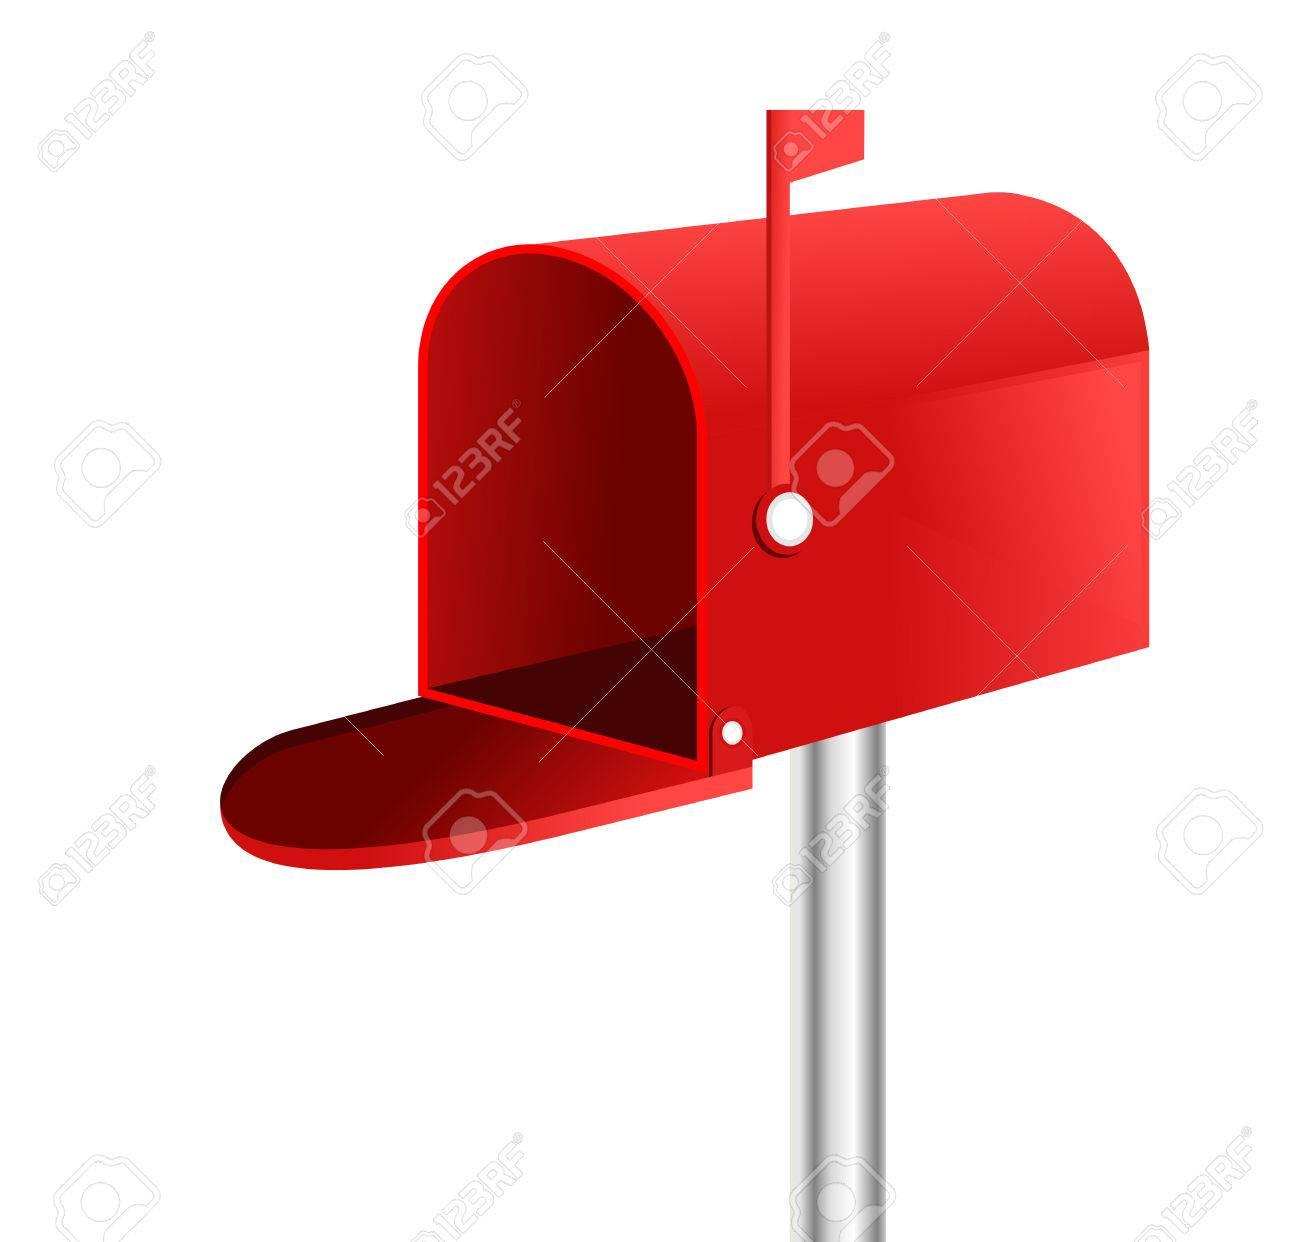 mail box - Monza berglauf-verband com